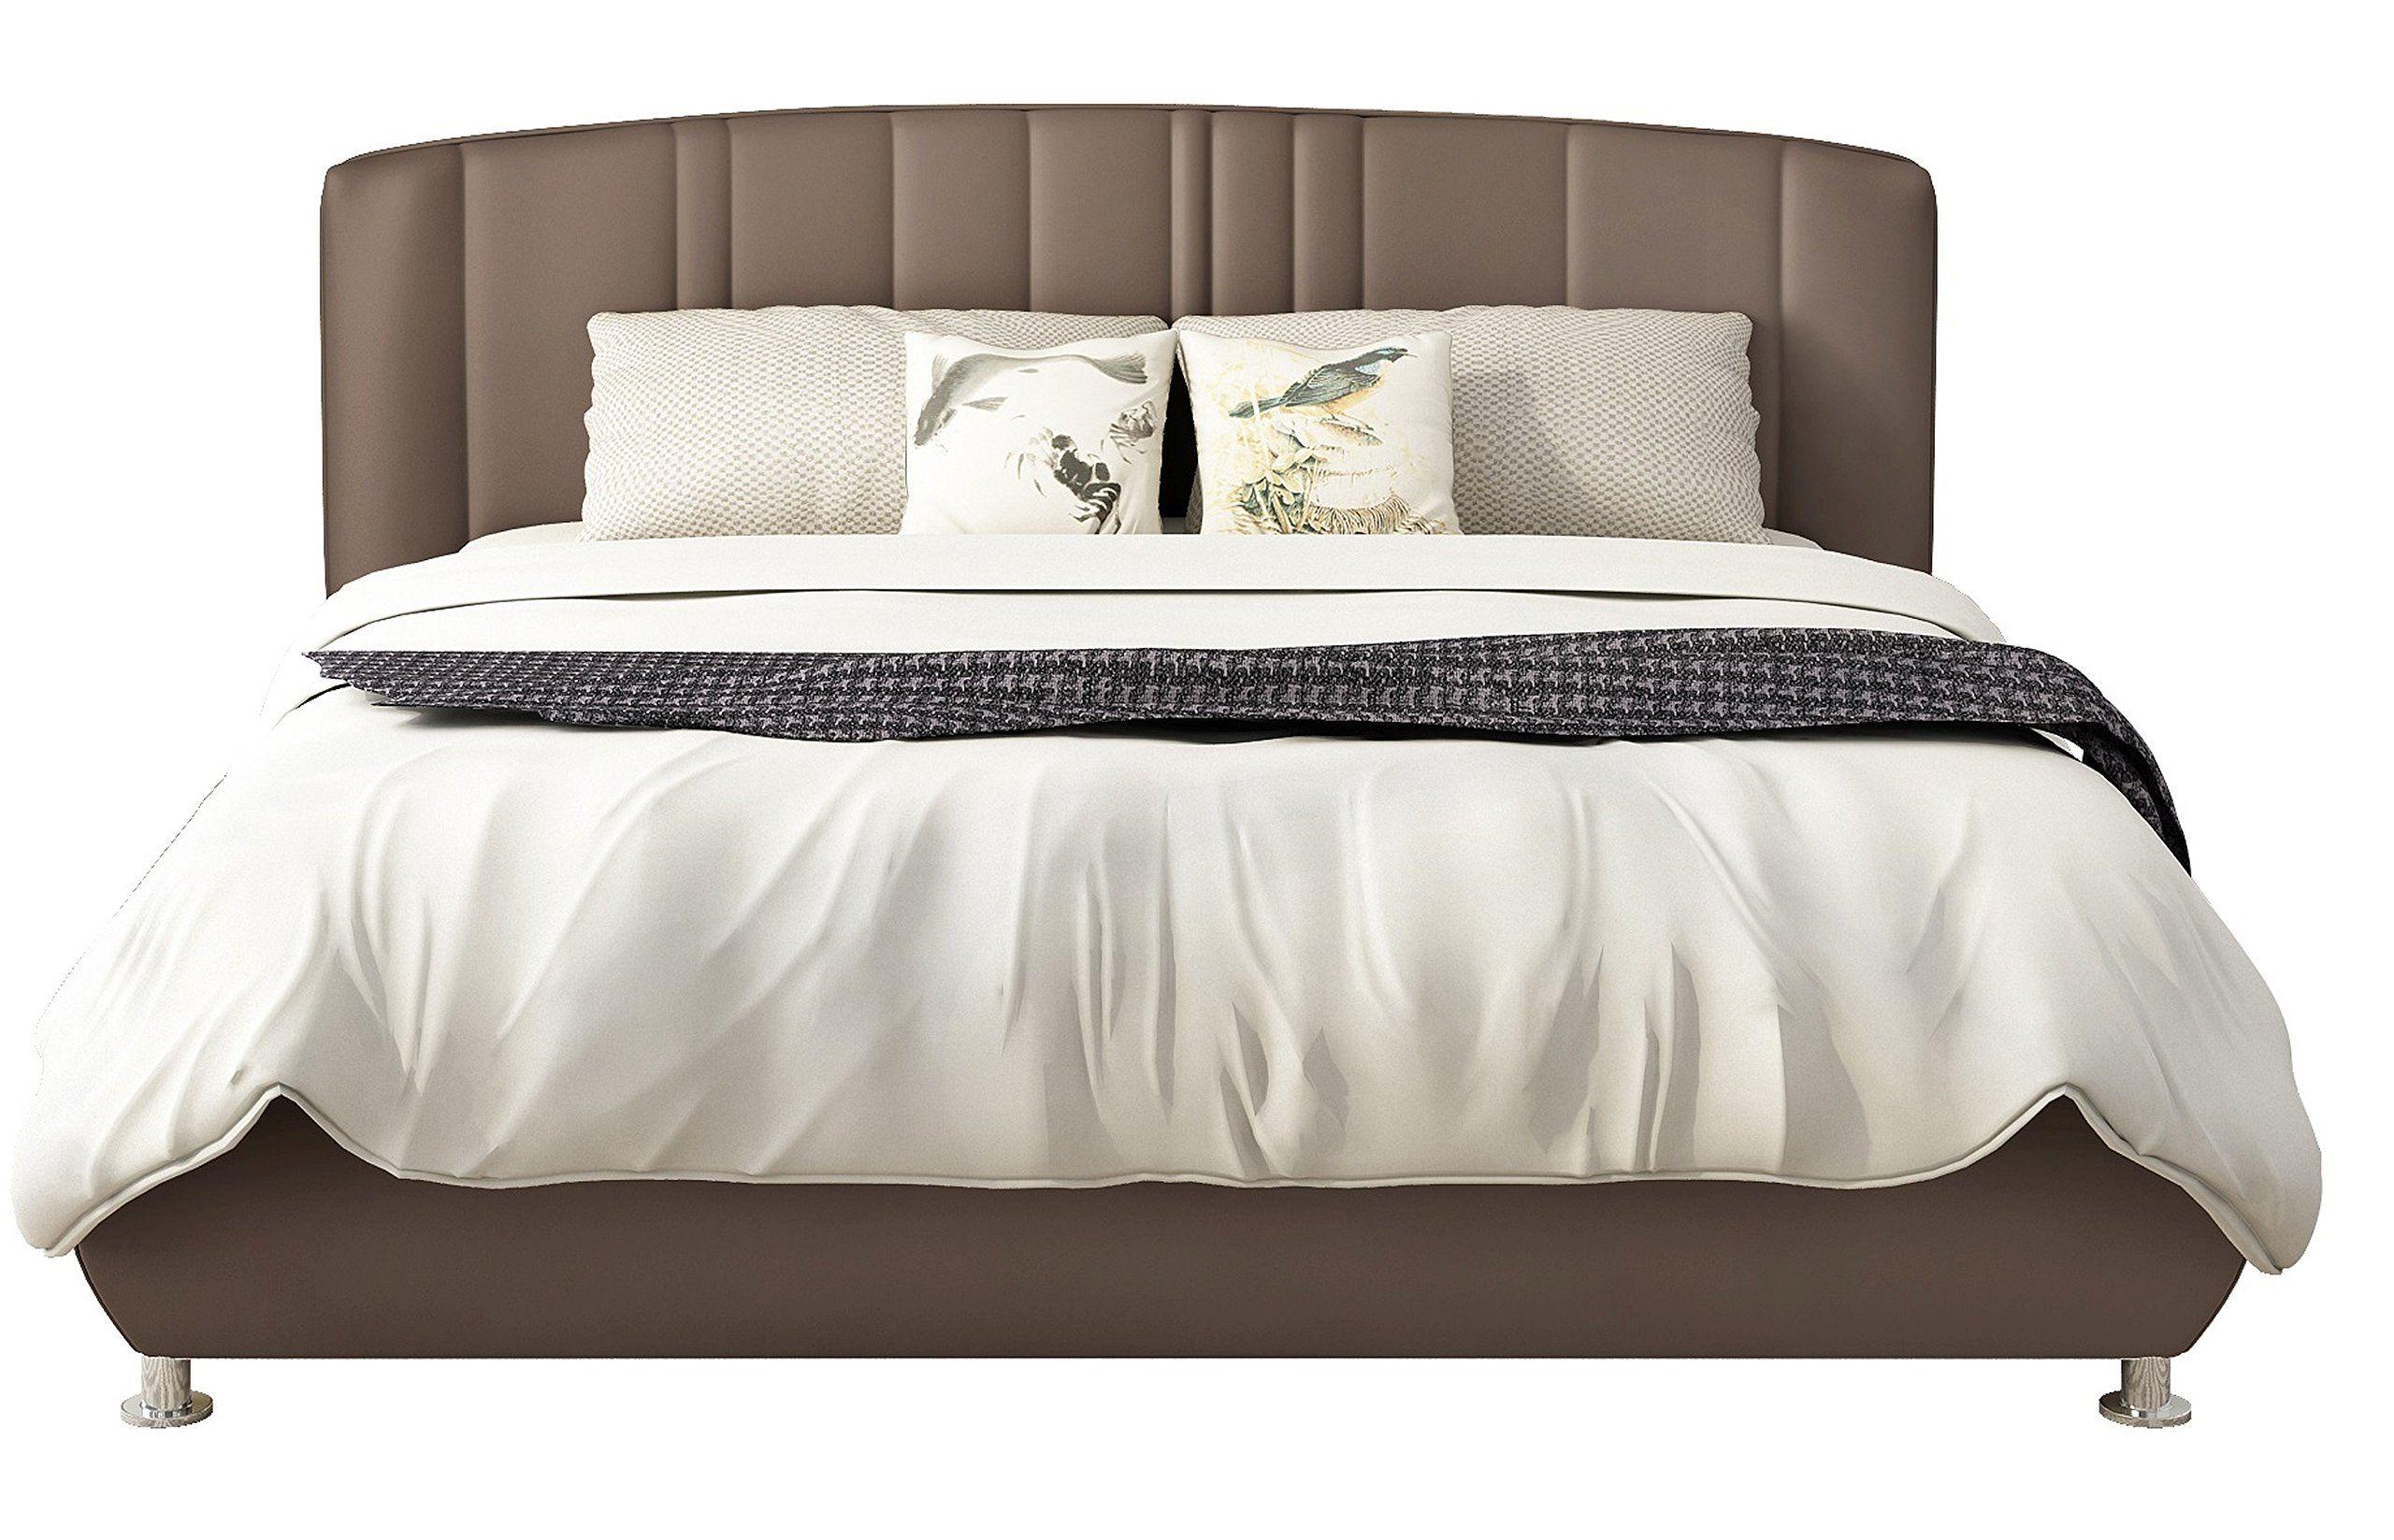 Iq Bed Modell Frisco Polsterbett Nuss 200 X 160 Kopfteil 107 Cm Hoch In 2020 Bed Furniture Home